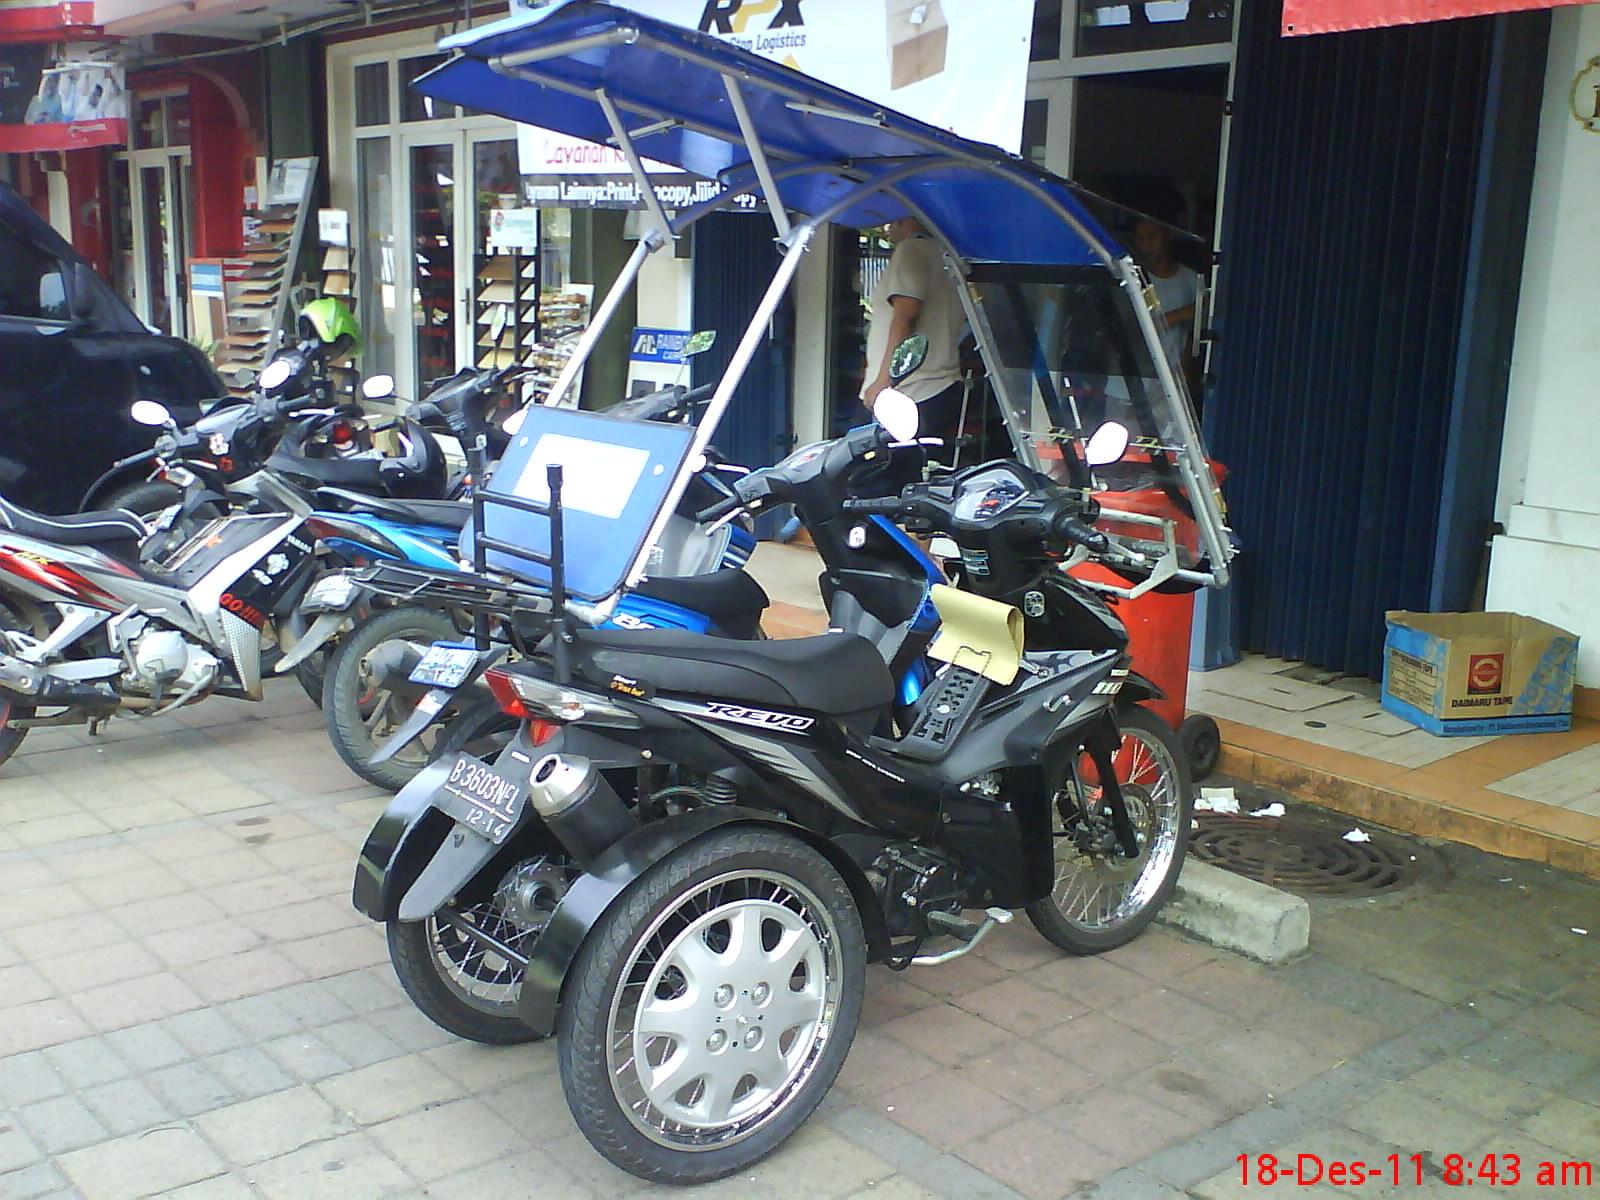 Ide 78 Modifikasi Motor Roda Tiga Tossa Terlengkap Cermin Modifikasi